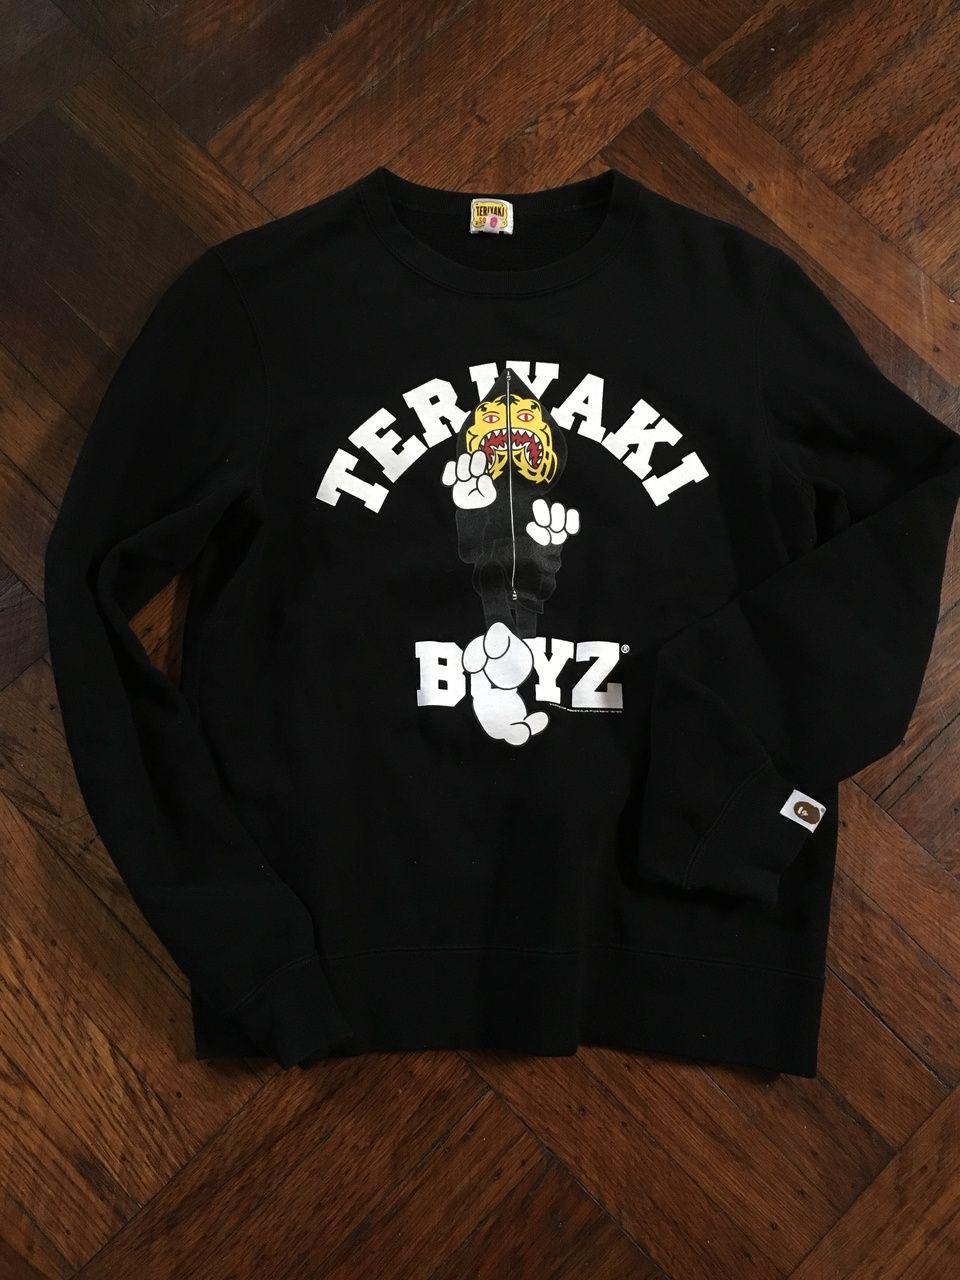 9ab1bafe1 Bape Bape Teriyaki Boyz Crewneck Size S $112 - Grailed | Bape | Bape ...